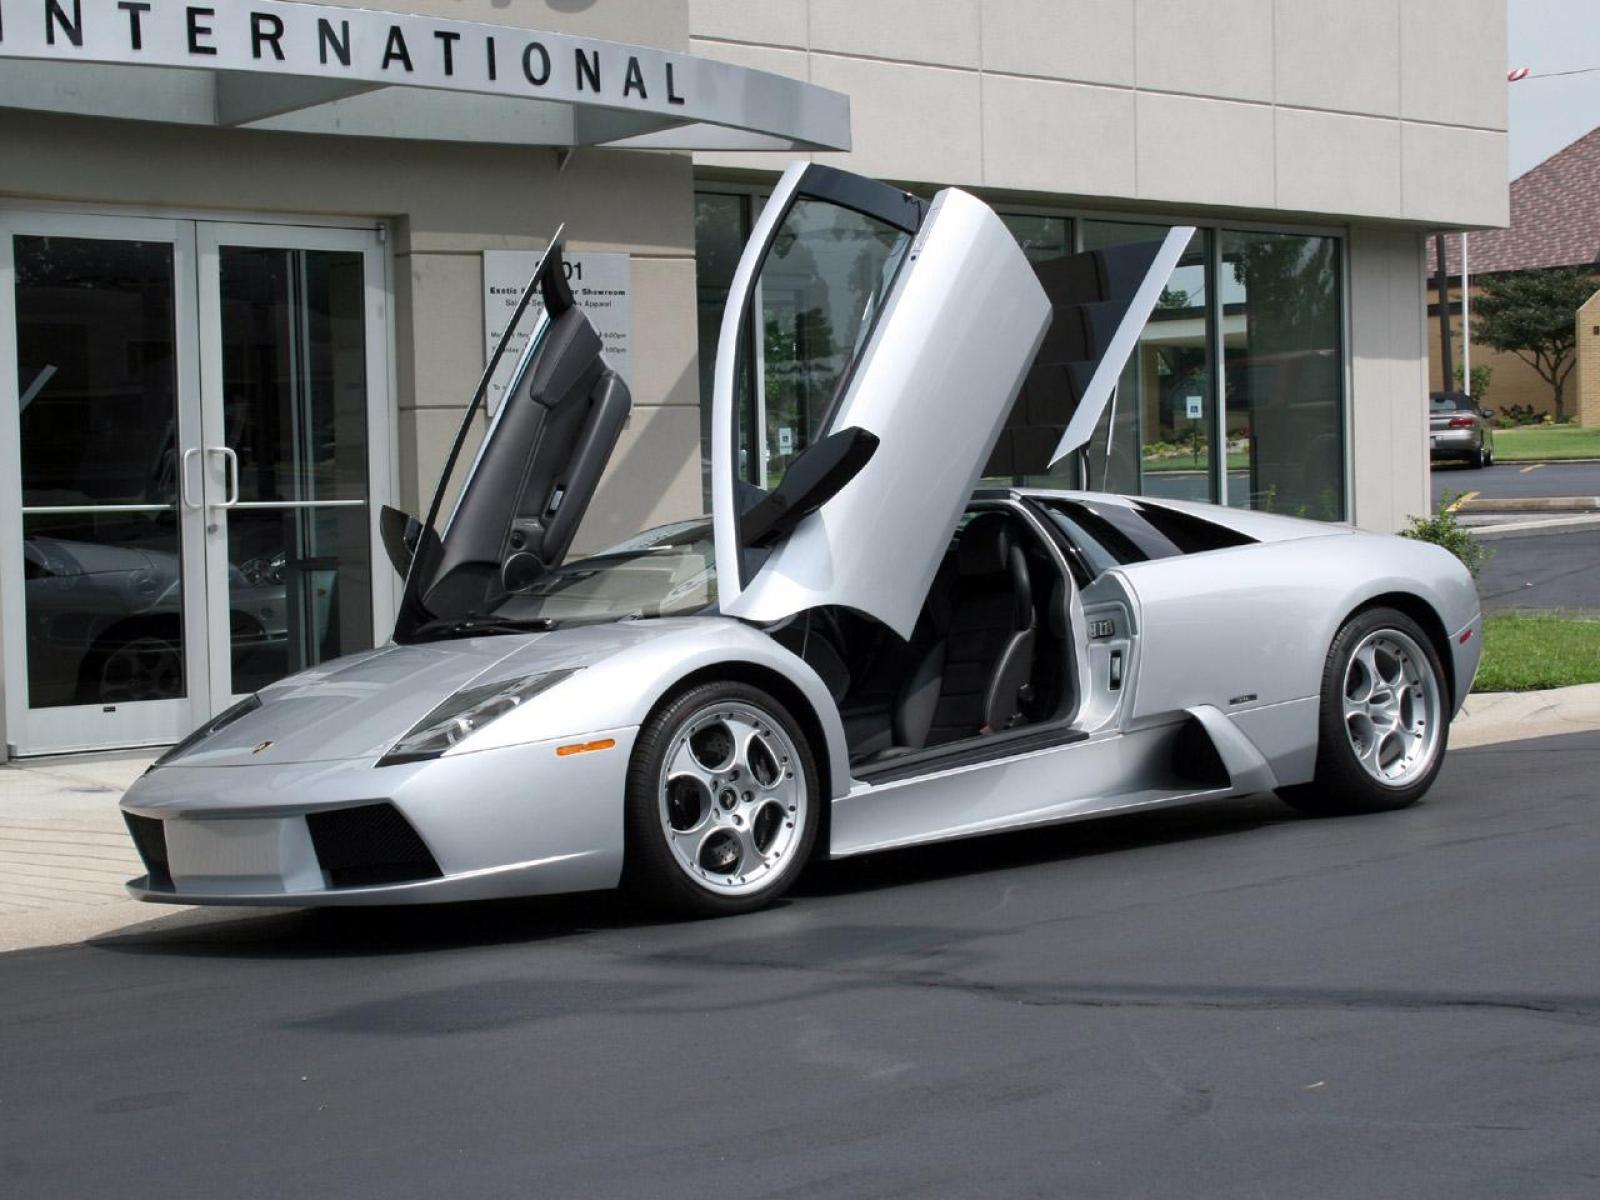 2003 Lamborghini Murcielago #8